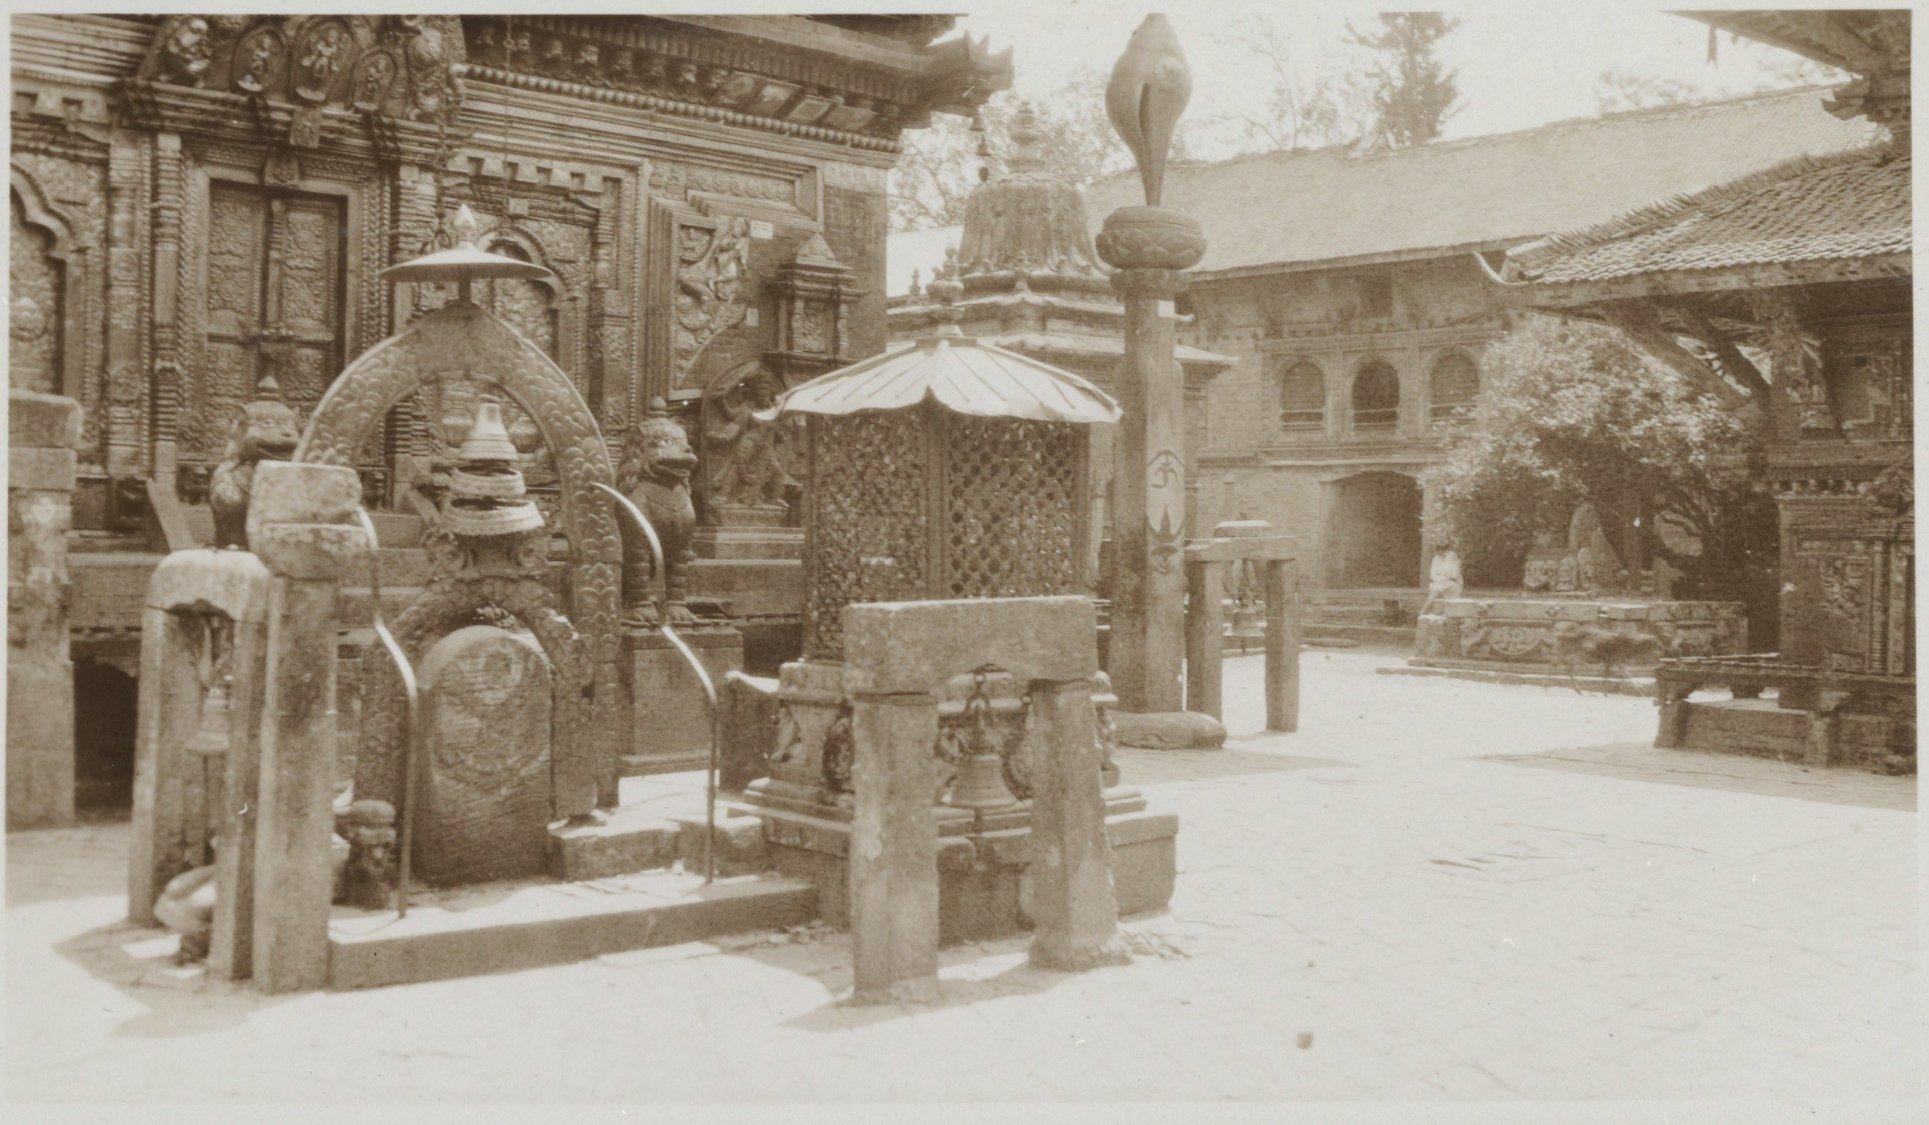 Changu Narayan 1932-34 image